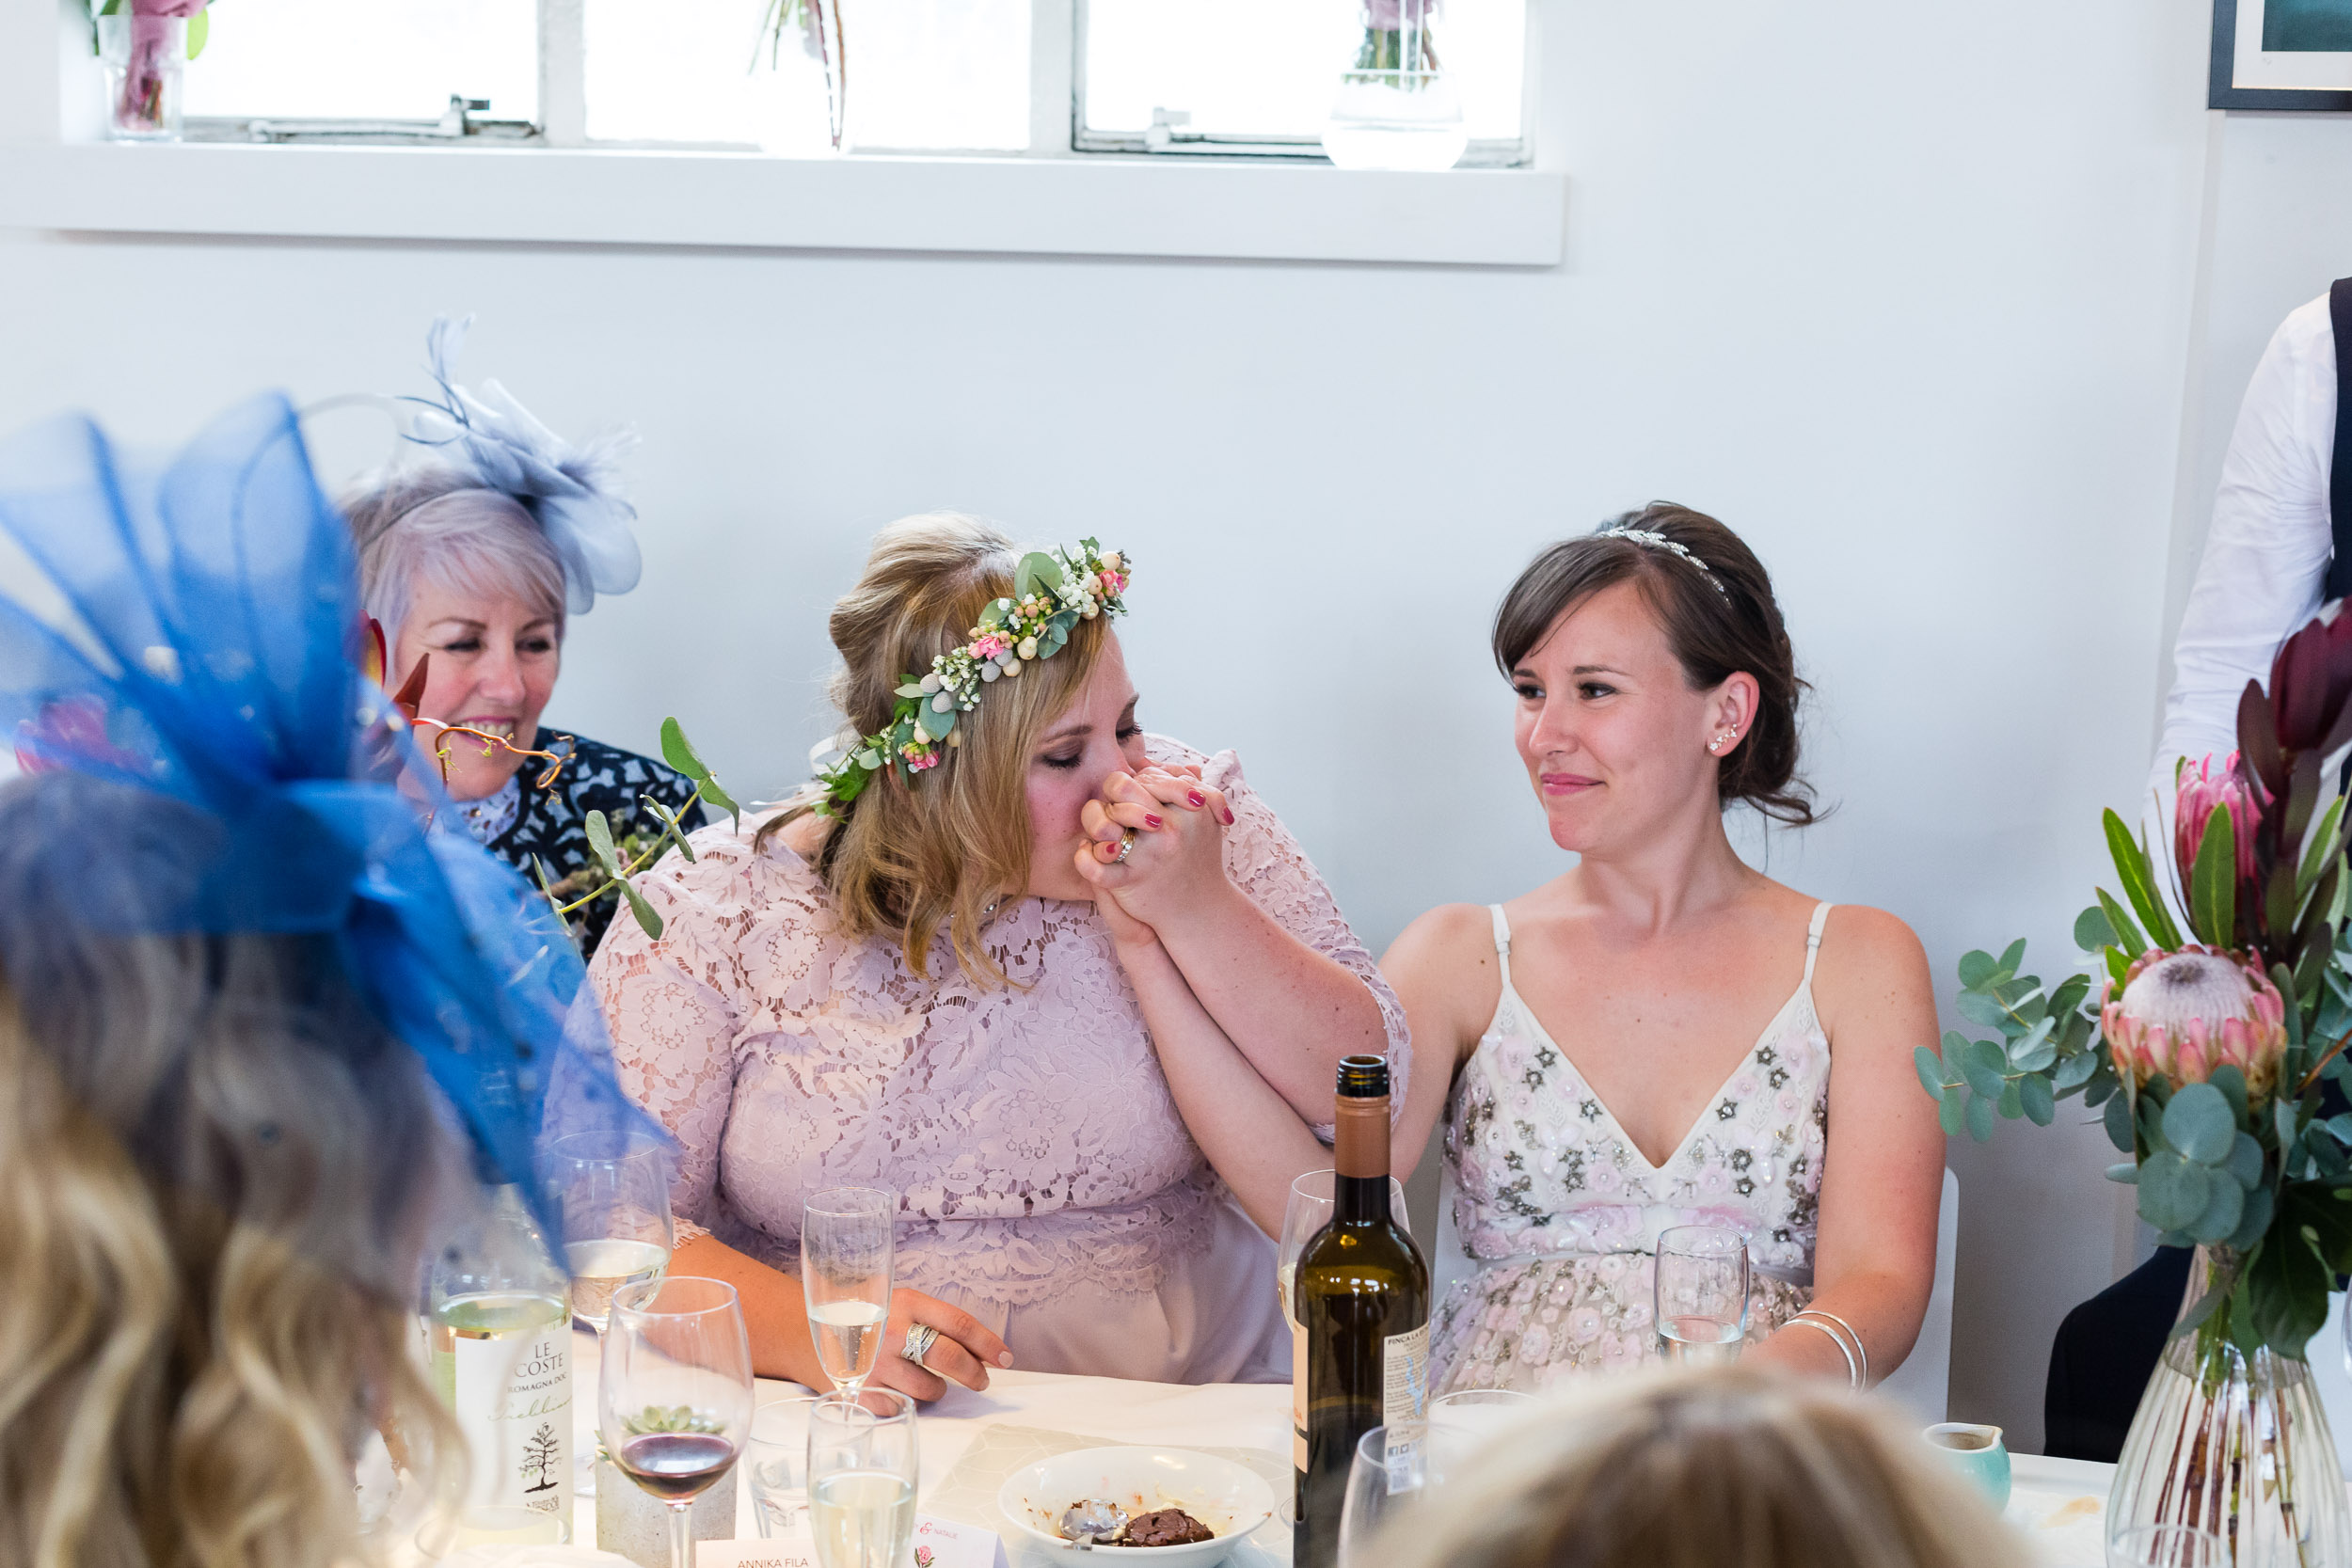 brockwell-lido-brixton-herne-hill-wedding-347.jpg